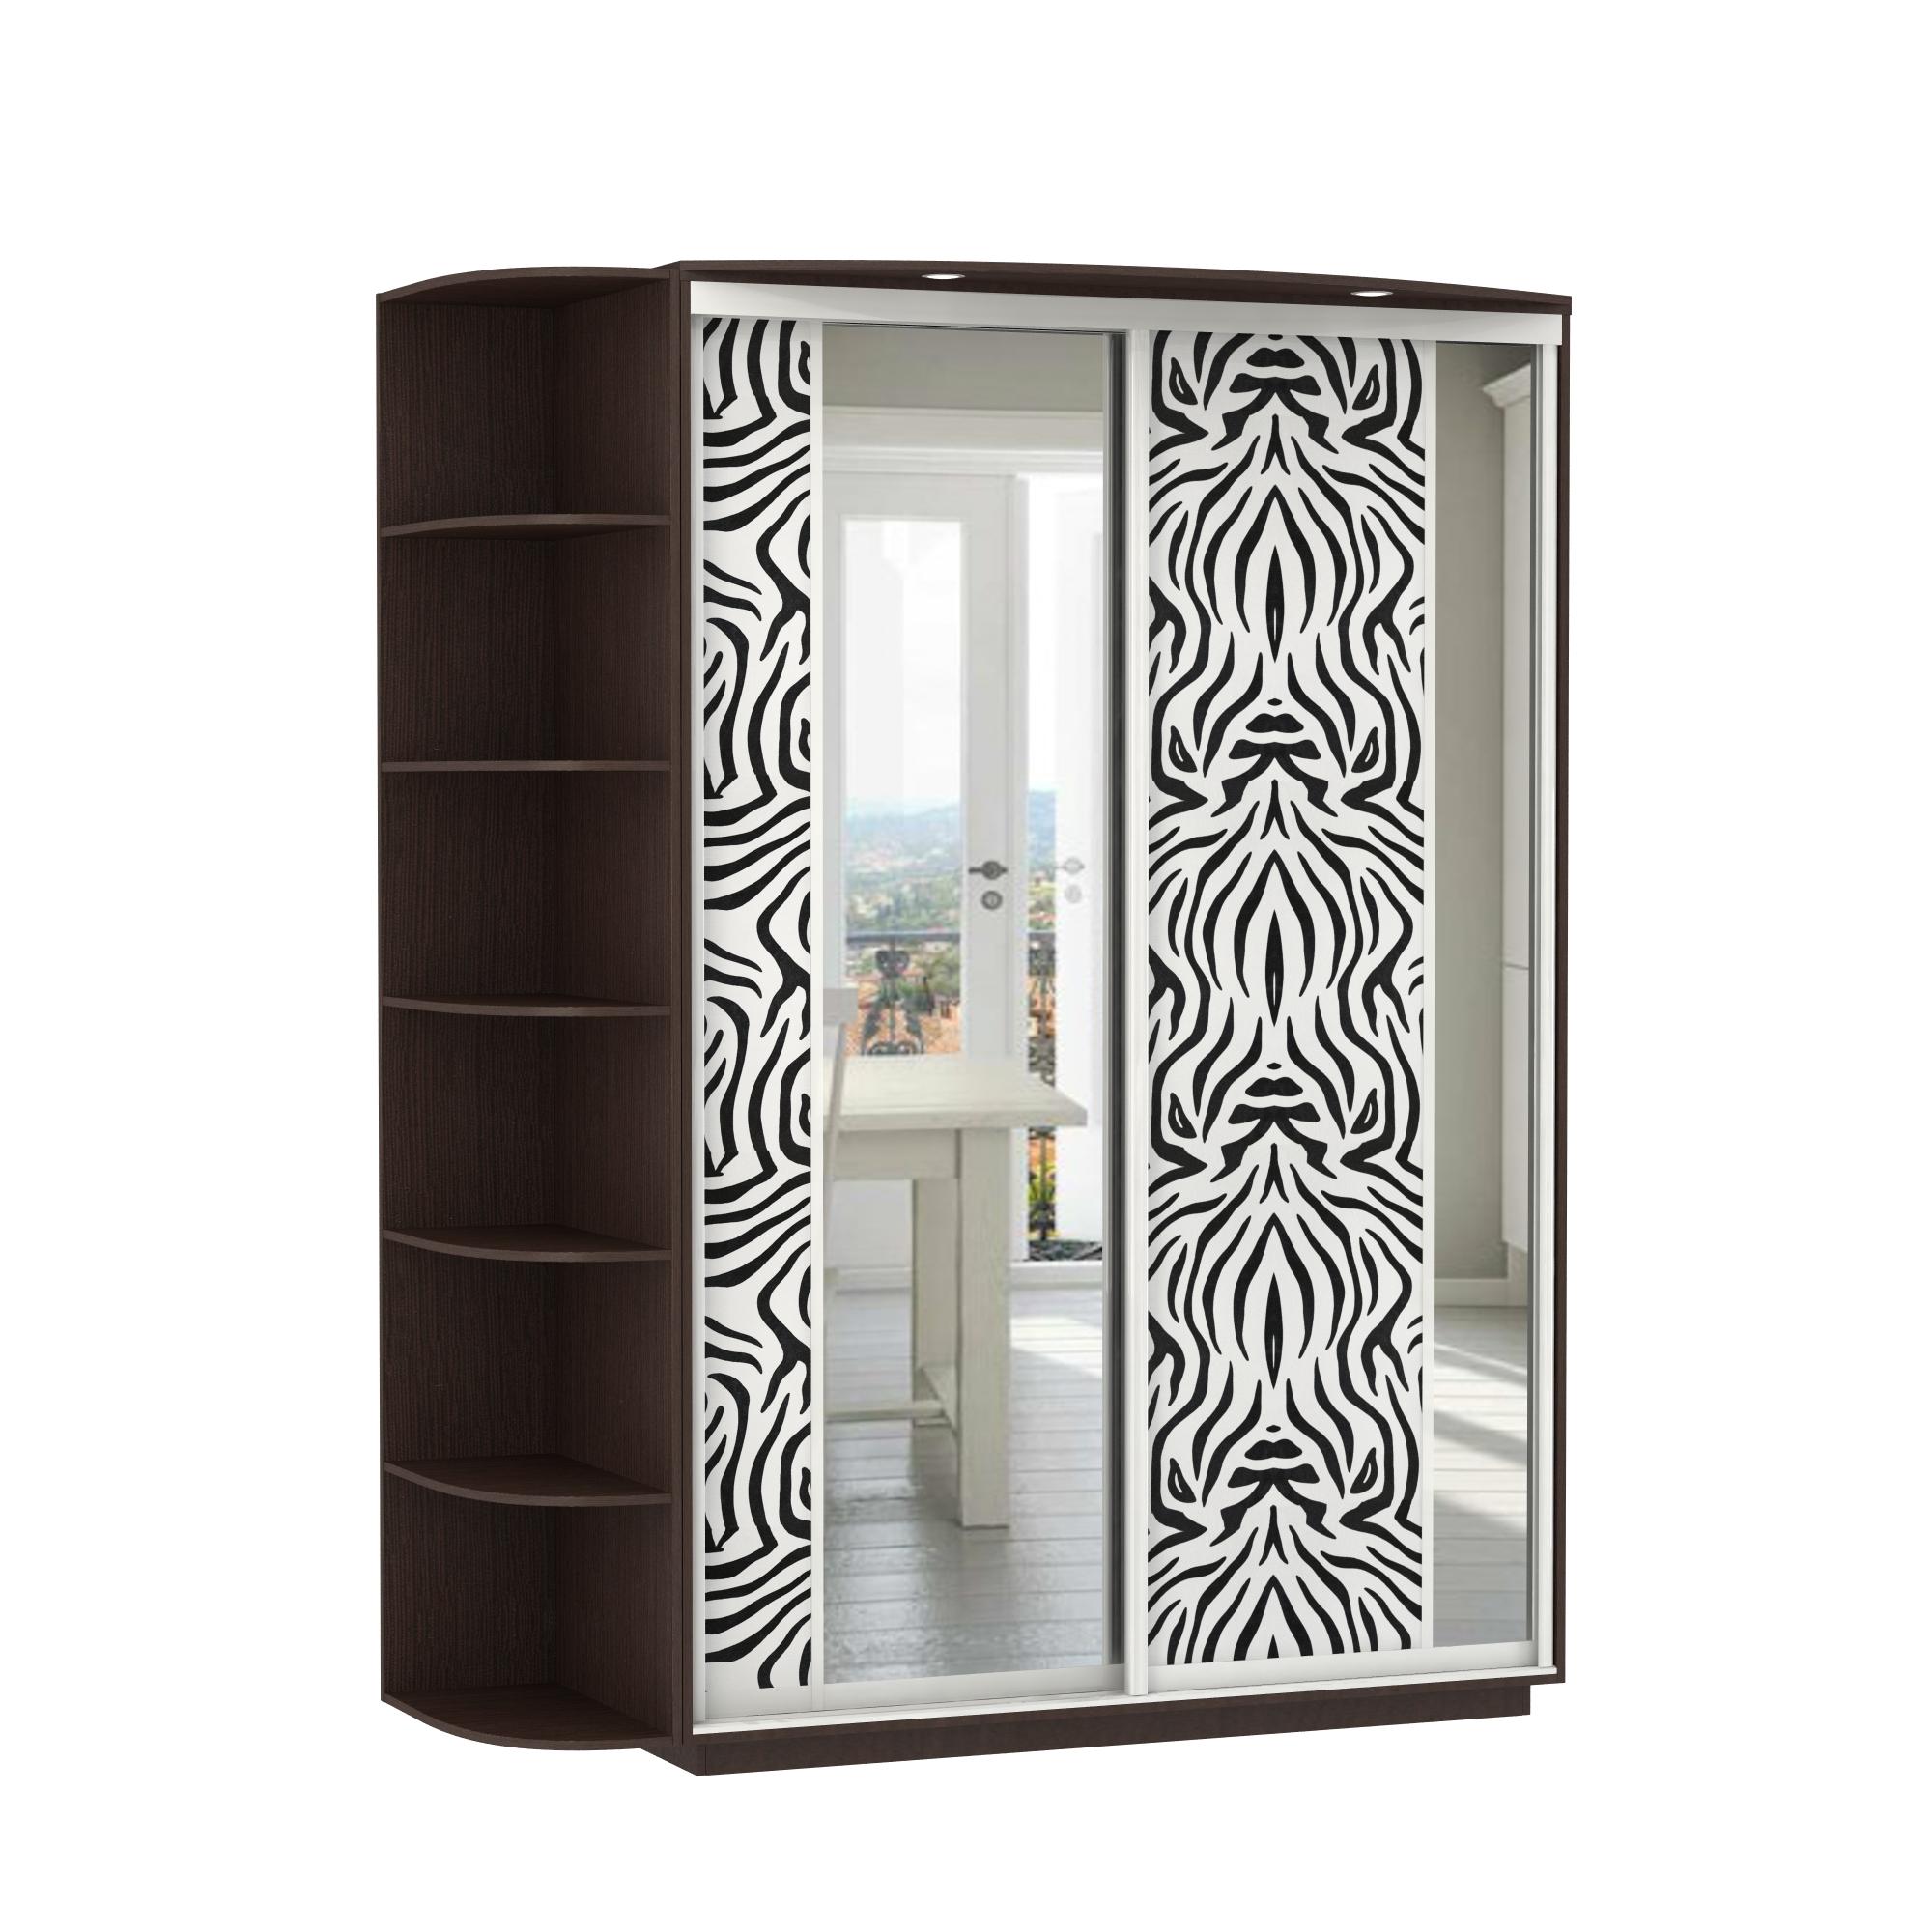 Шкафы-купе : 2-х дверный, корпус венге, двери экокожа, зерка.